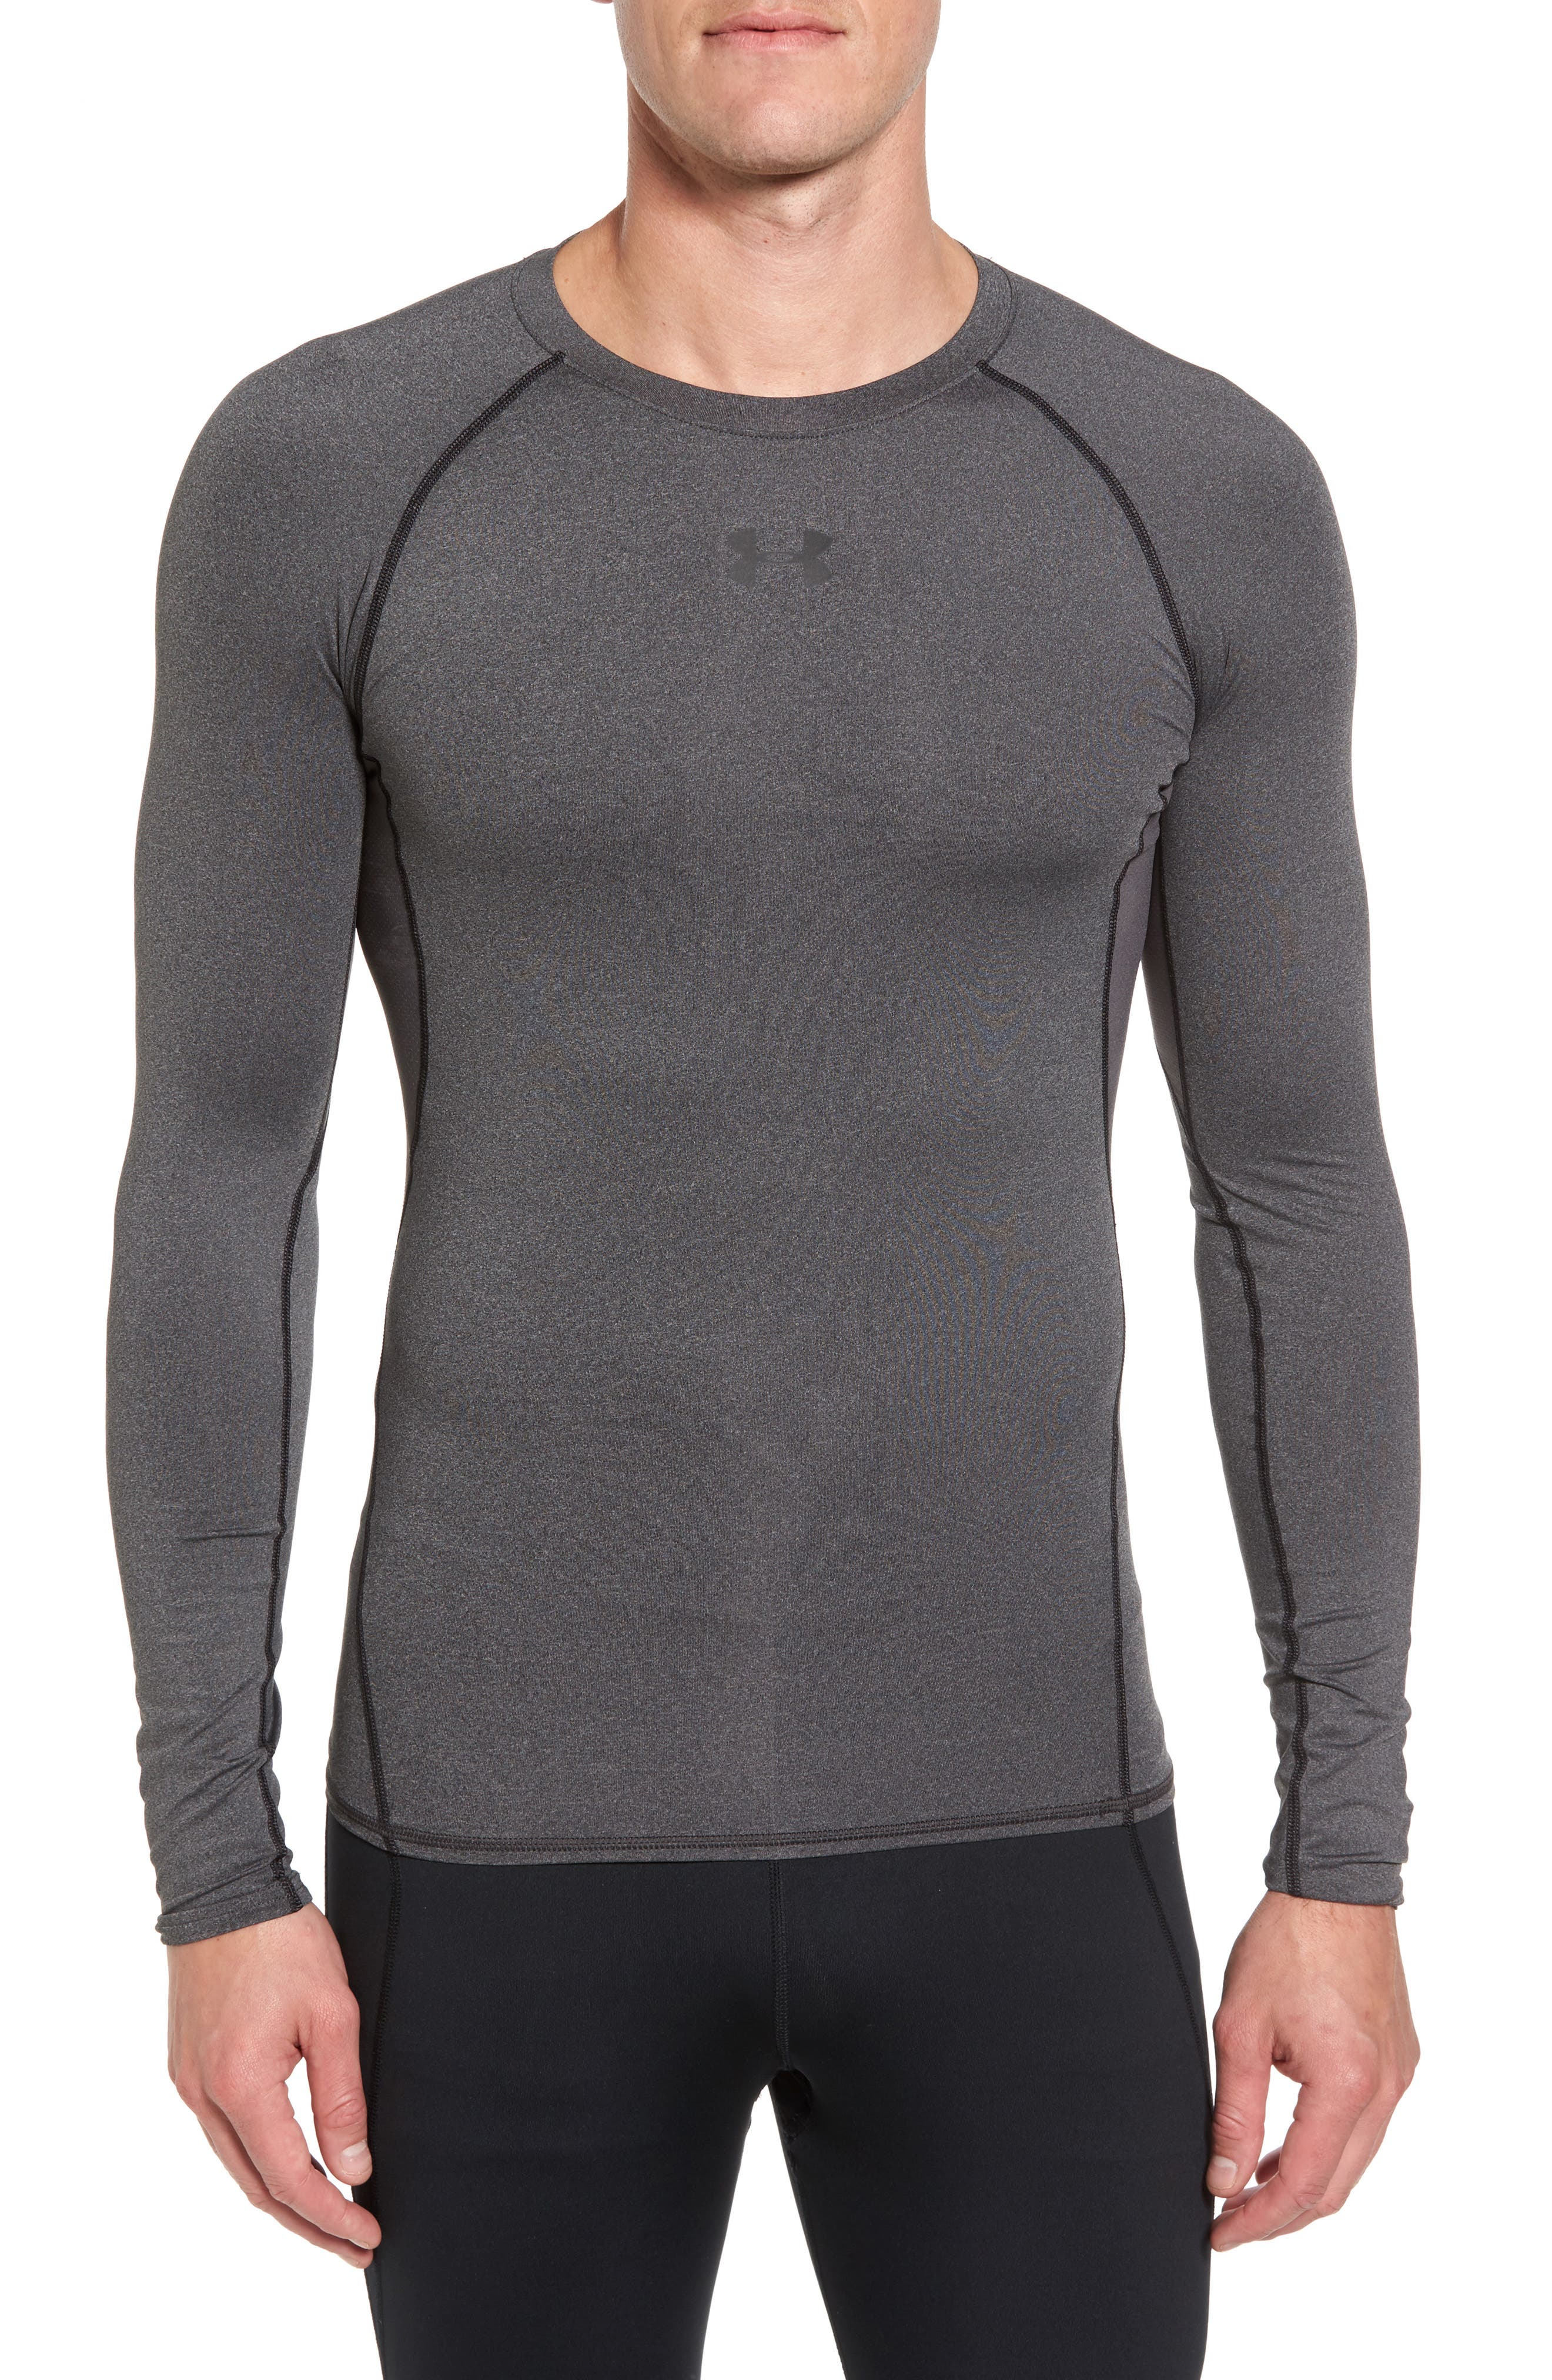 HeatGear<sup>®</sup> Compression Fit Long Sleeve T-Shirt,                             Main thumbnail 1, color,                             CARBON HEATHER/ BLACK